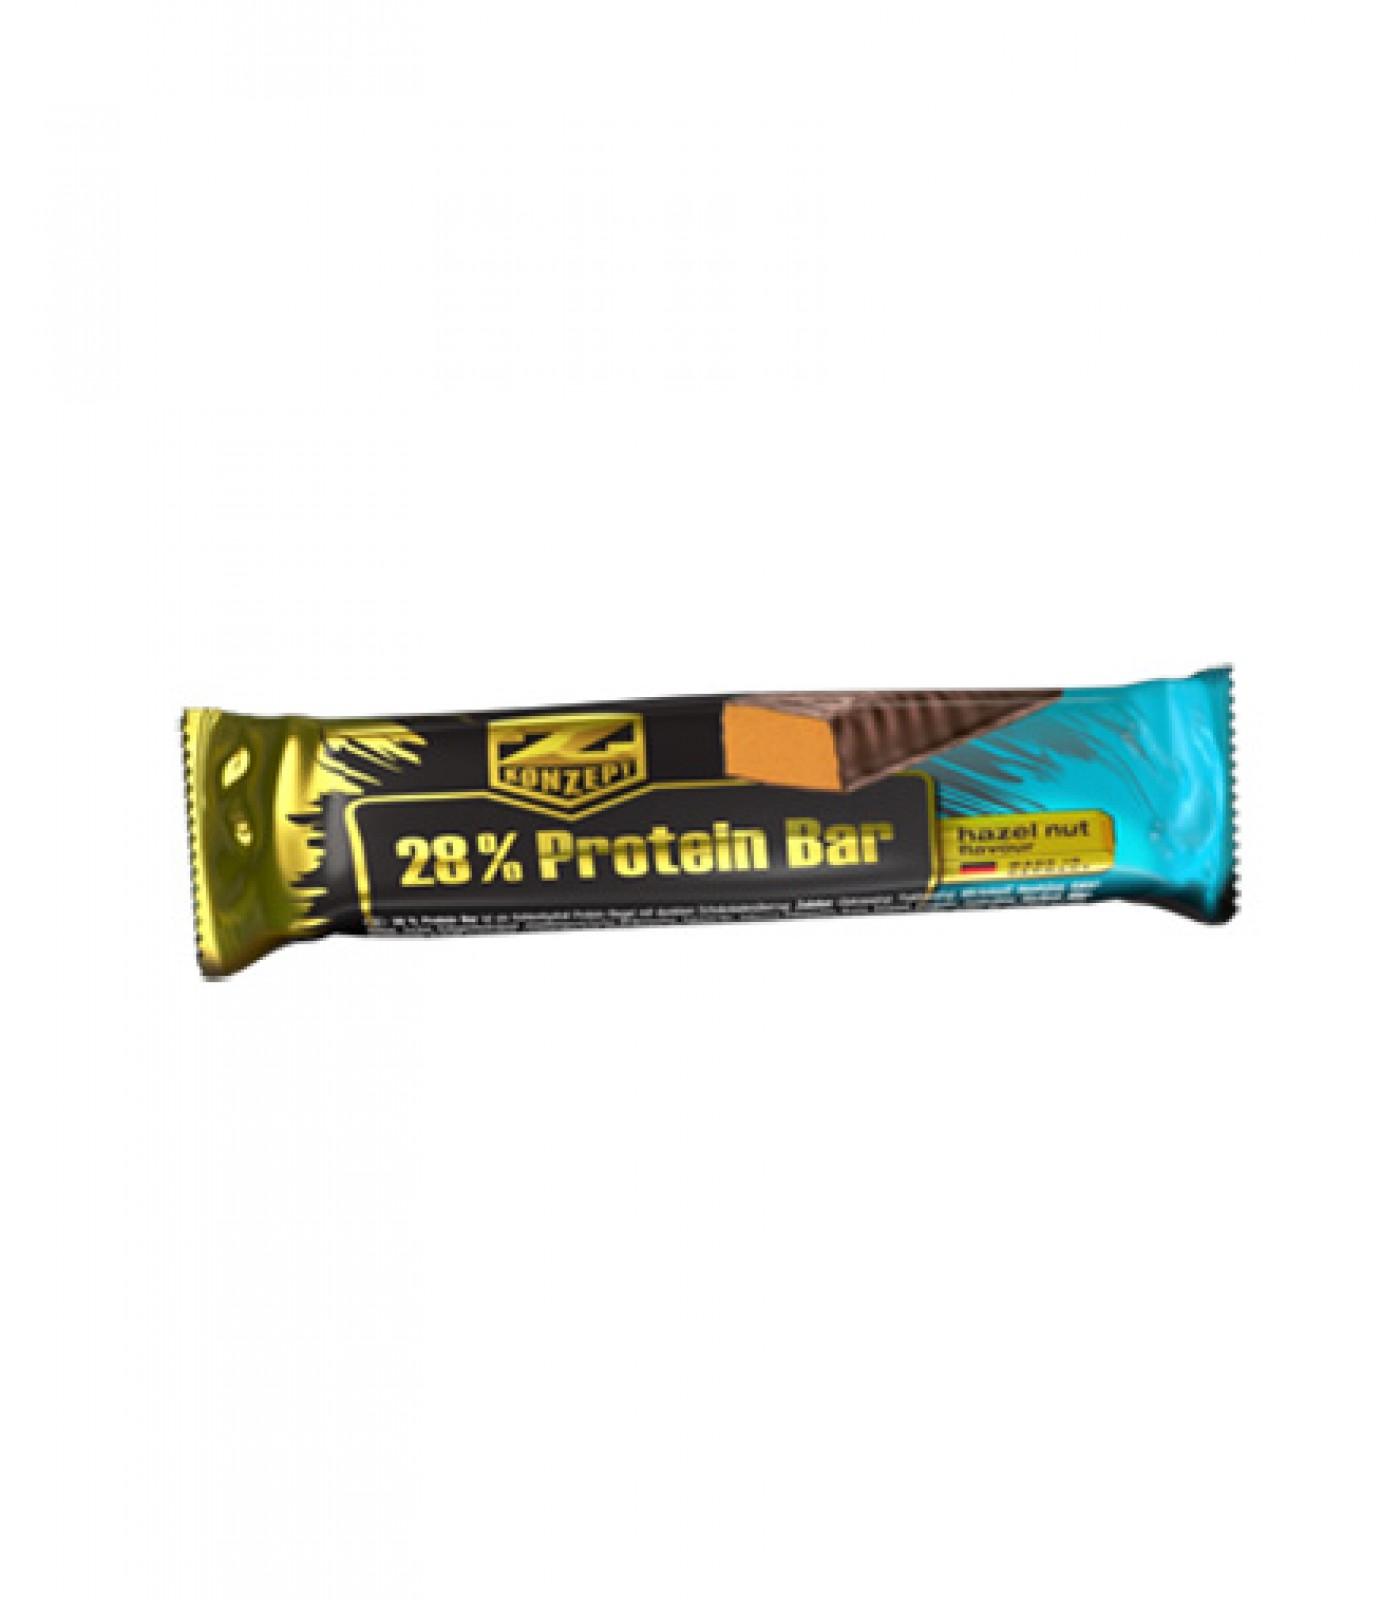 Z Konzept - 28% Protein bar / 35 gr. x 24 bars